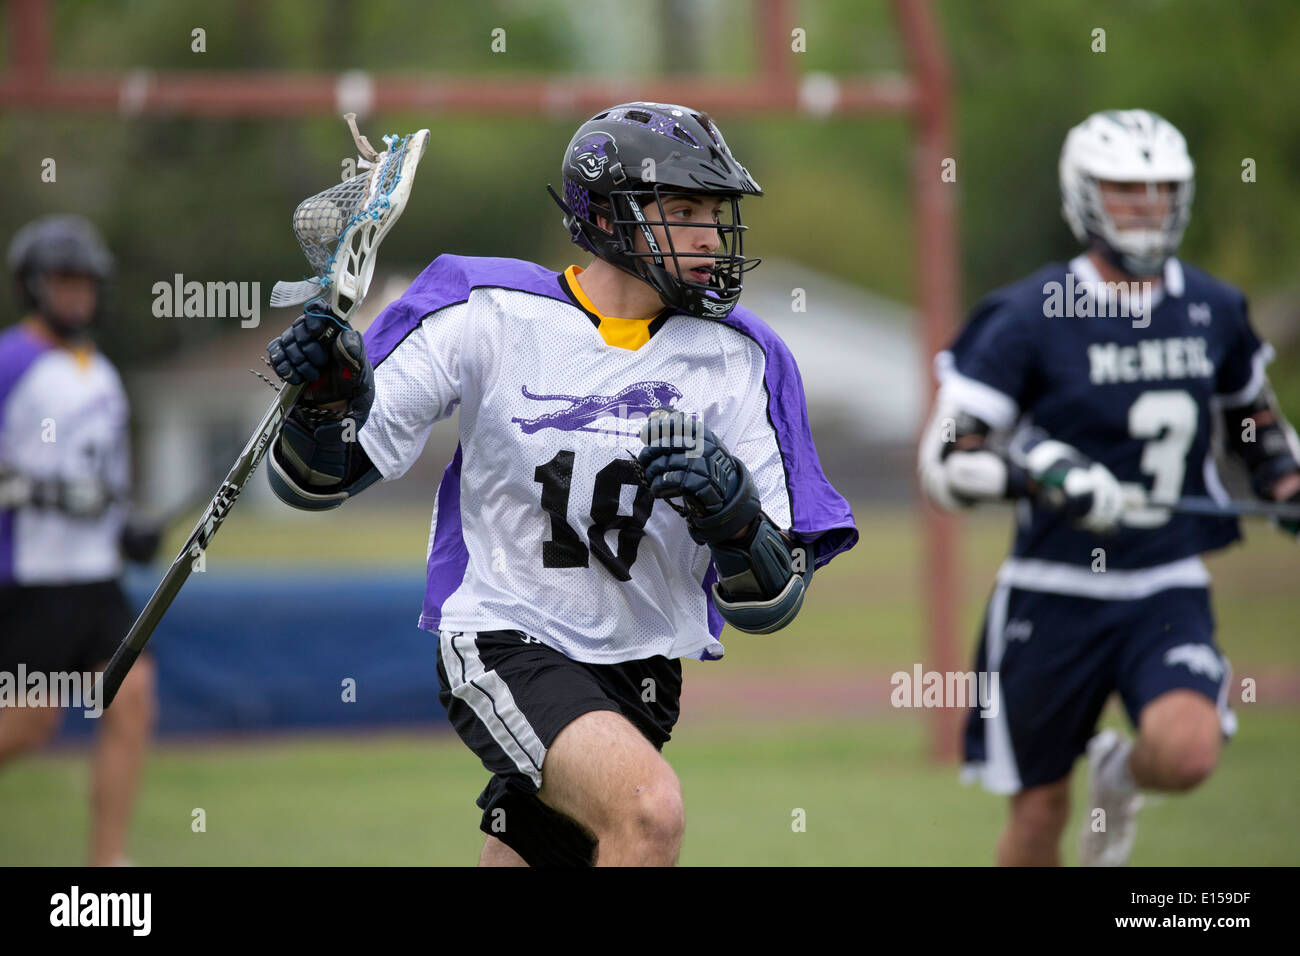 Texas high school boy's lacrosse action featuring LBJ High School (purple) vs. Round Rock McNeil (dark blue). - Stock Image